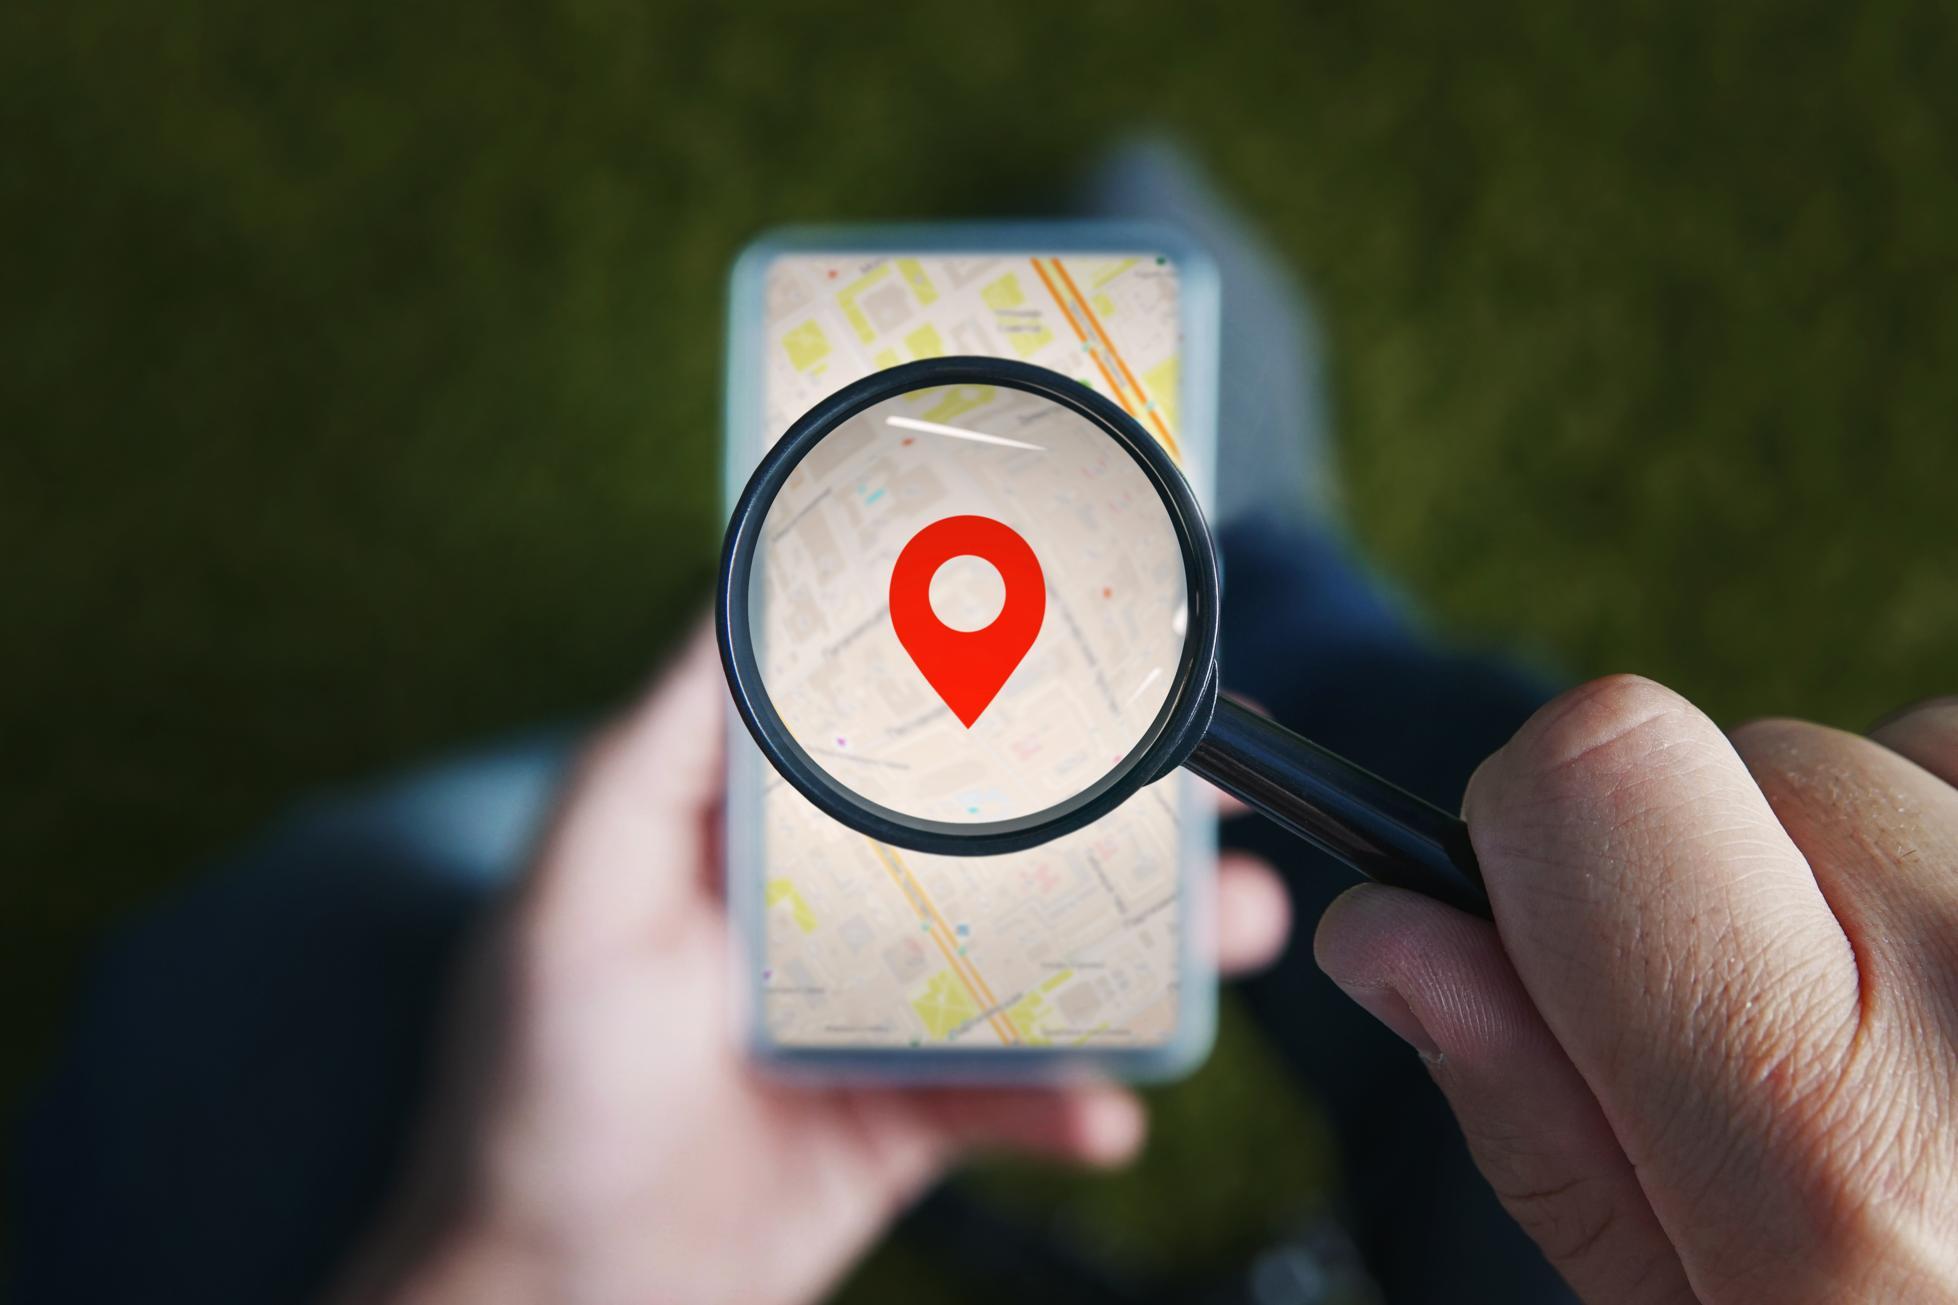 Circles surveillance technology locates smartphones across the globe.